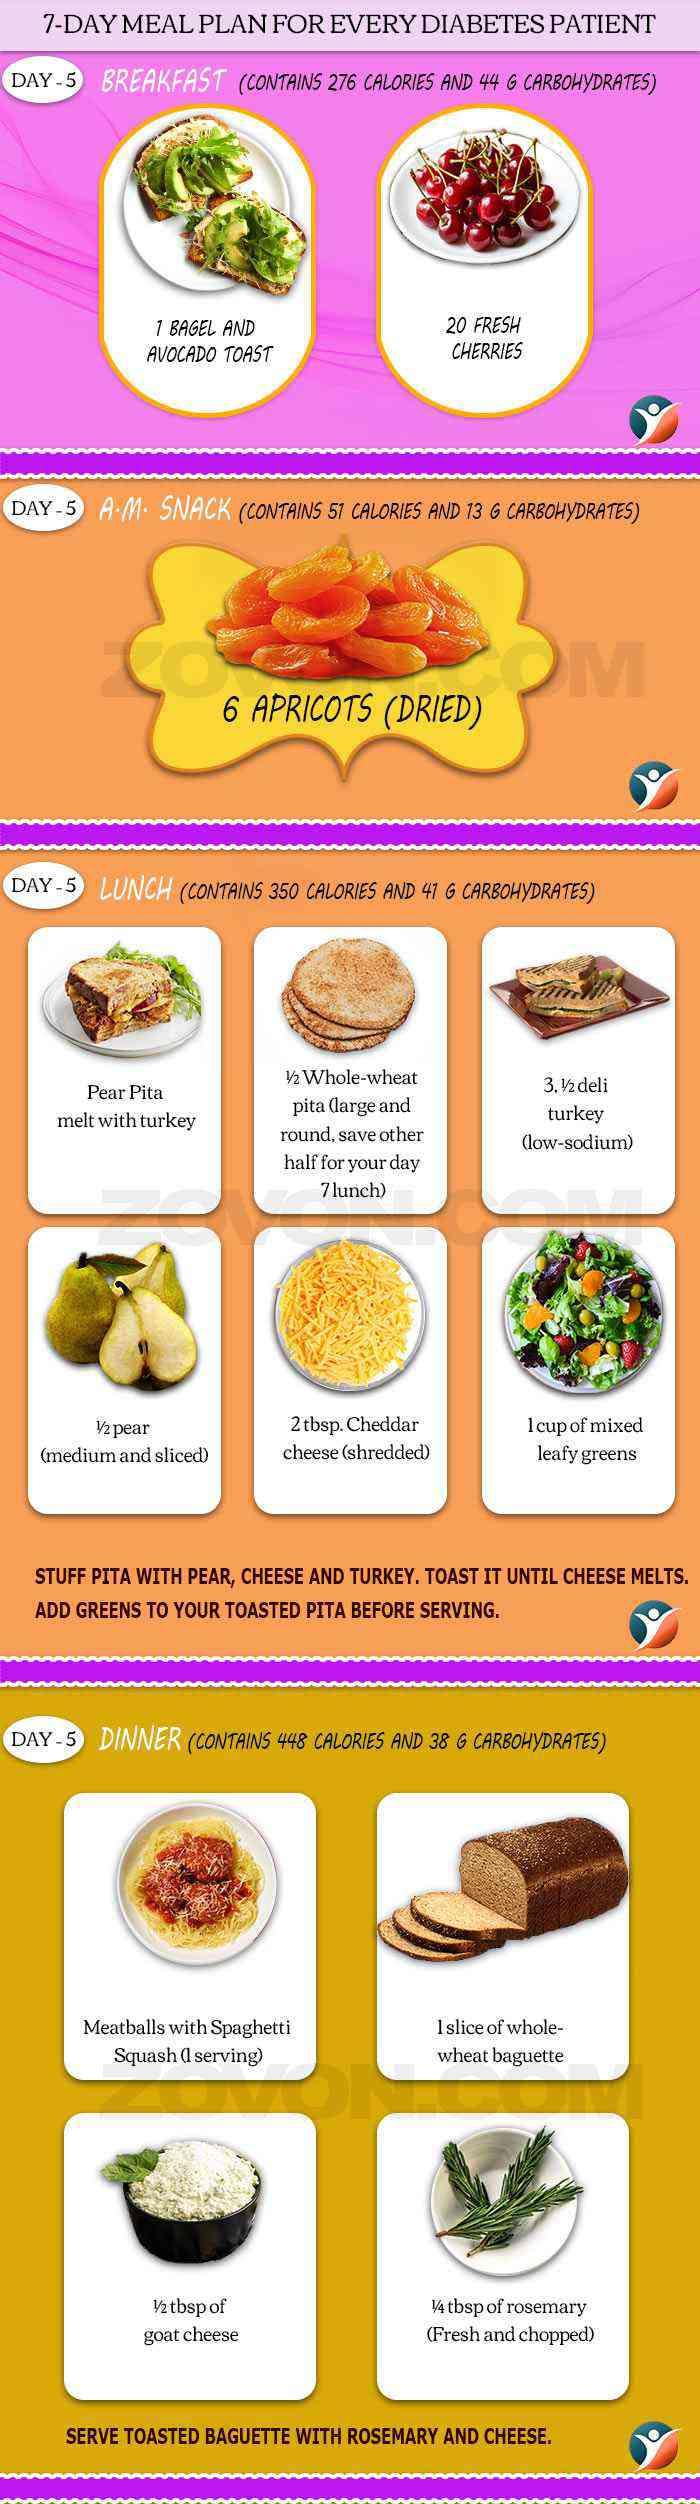 diabetes diet plan day 5